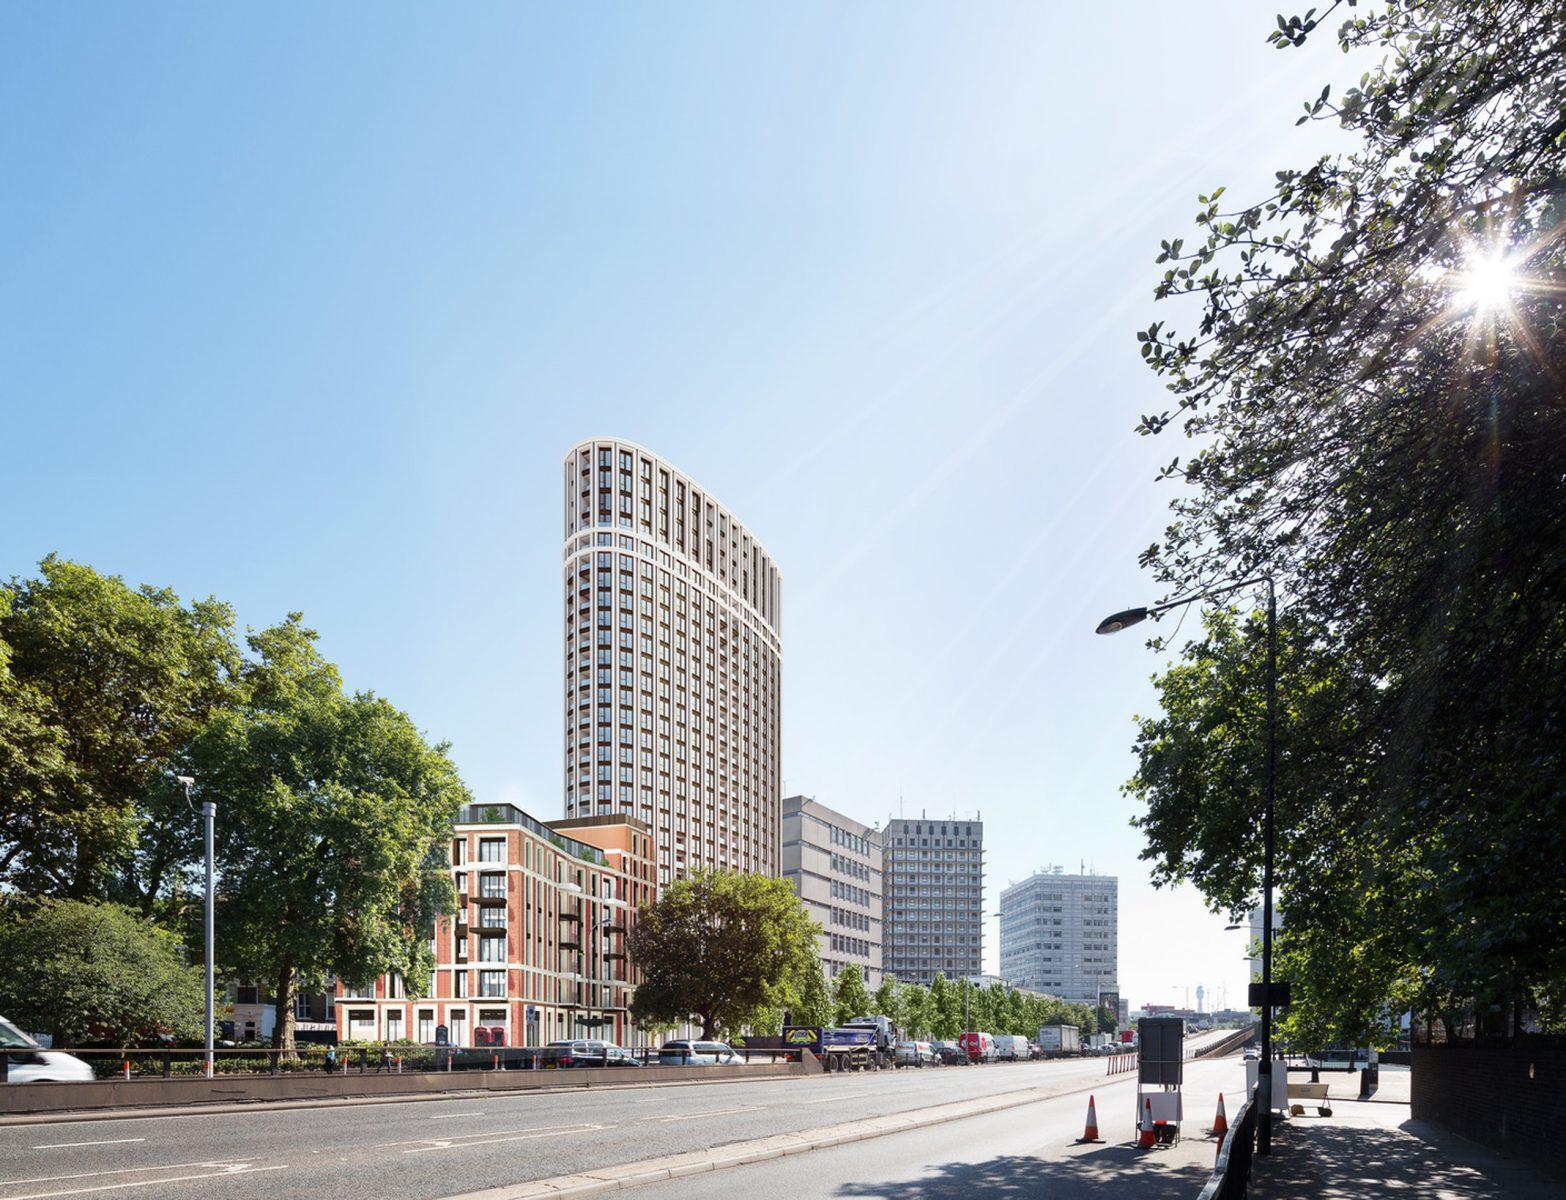 westmark tower london modern georgian architecture berkeley homes architects jersey9